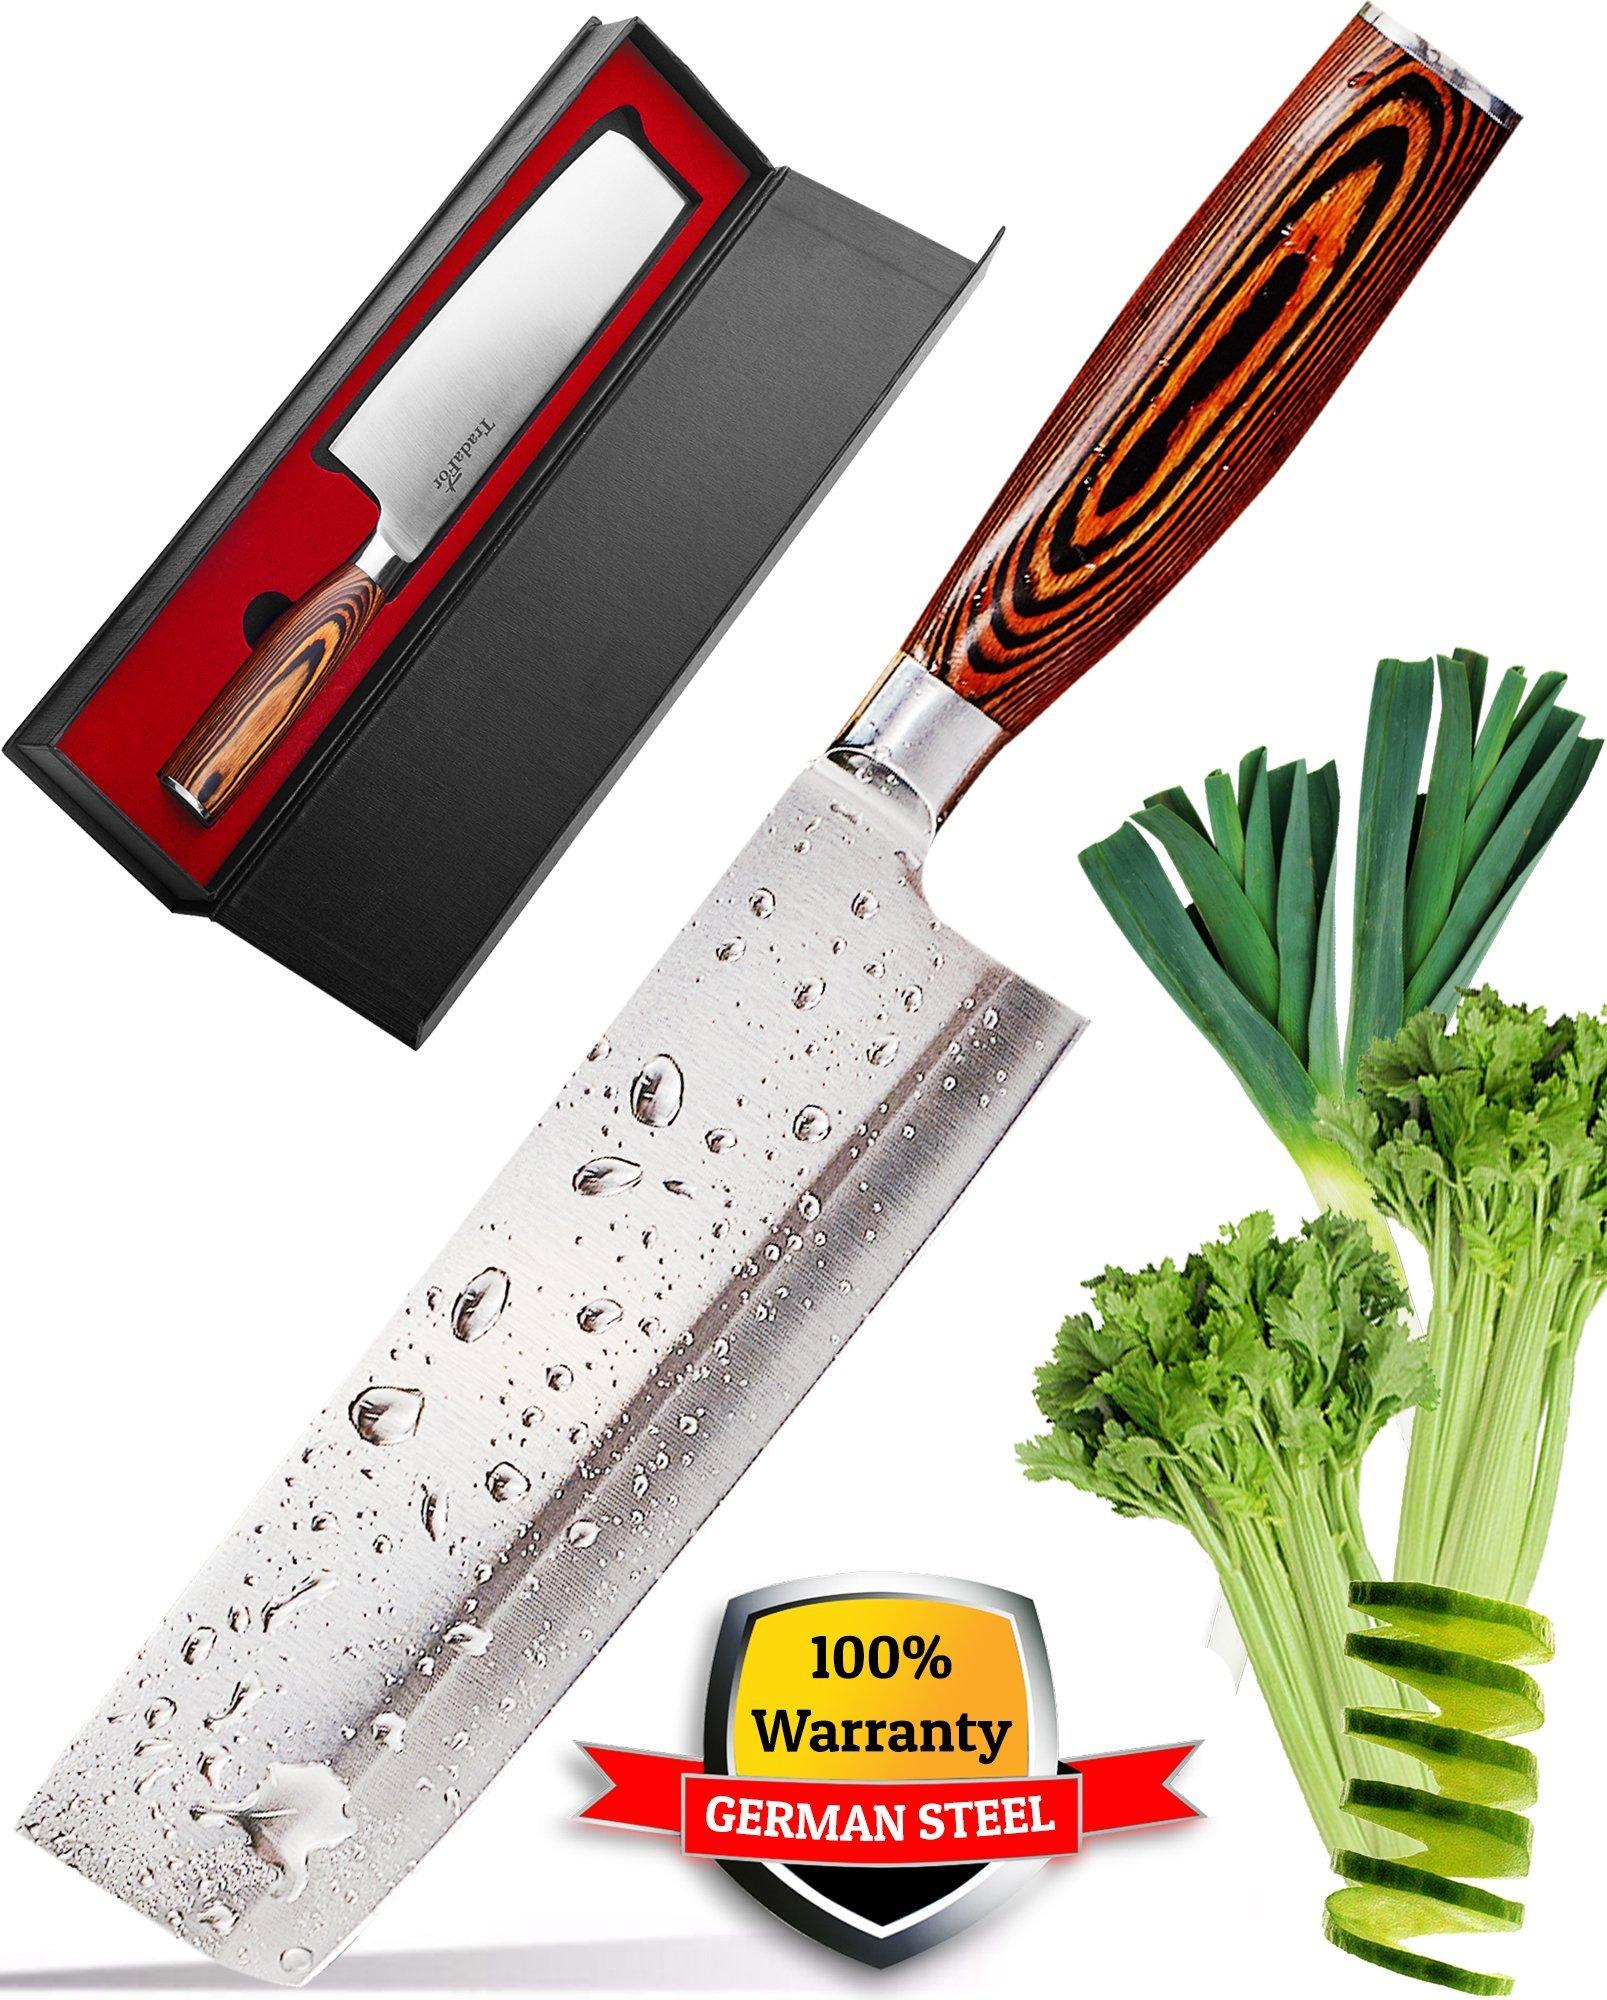 Vegetable Knife - Japanese Chef Knife - Usuba - Sharp Knife - Nakiri Knife - Kitchen Knife - Stainless Steel High Carbon Pro Chef Knife - 7Inch Dicing Mincing Veg Knife - Best Gift in Stylish Gift Box